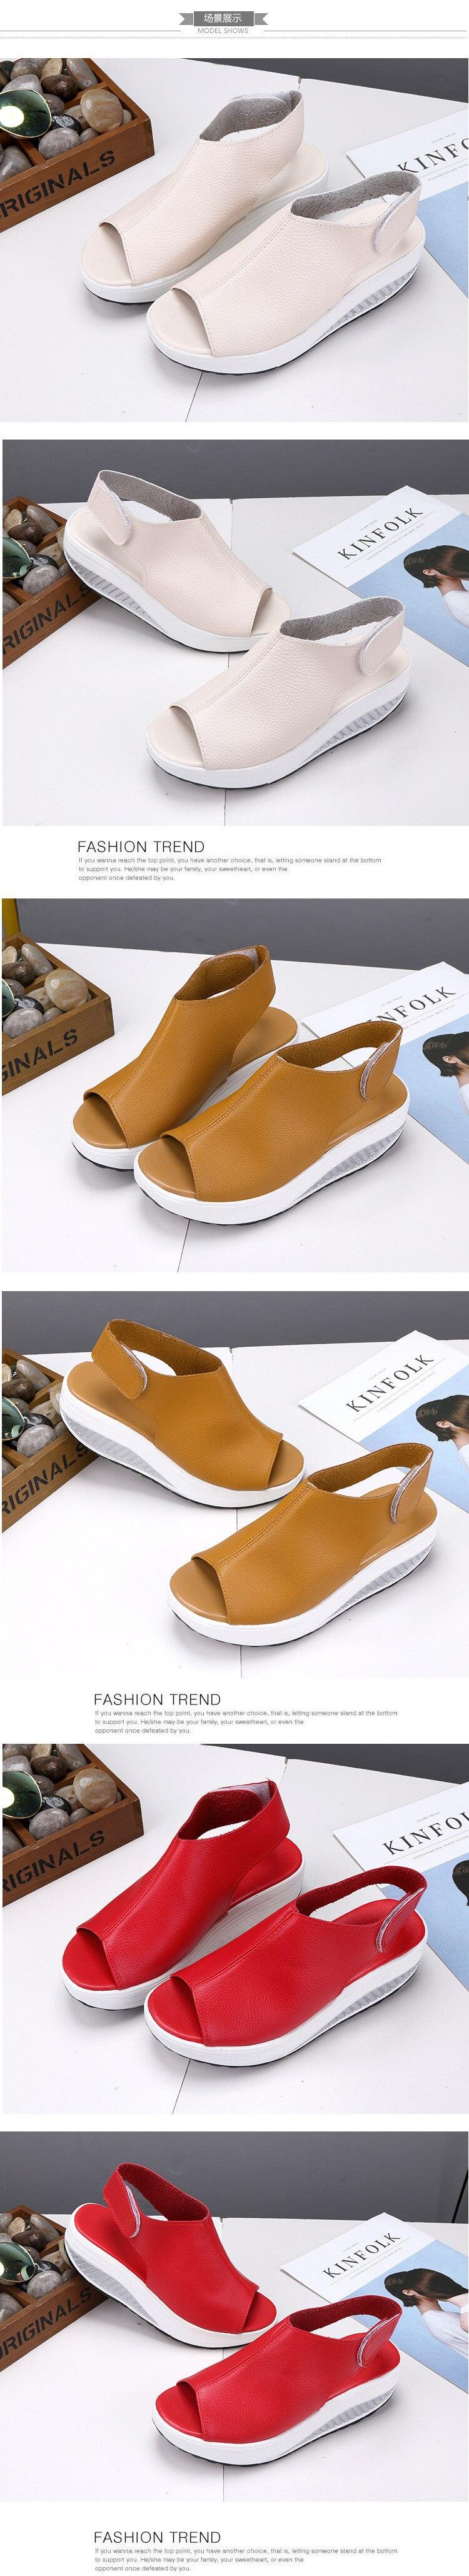 HTB1mllwd1SSBuNjy0Flq6zBpVXa2 2019 Fashion Women Summer Female Sandals Vintage Wedges Platform Shoes Peep Toe Sandal High Heels Fish Toe Shoes Zapatos Mujer99